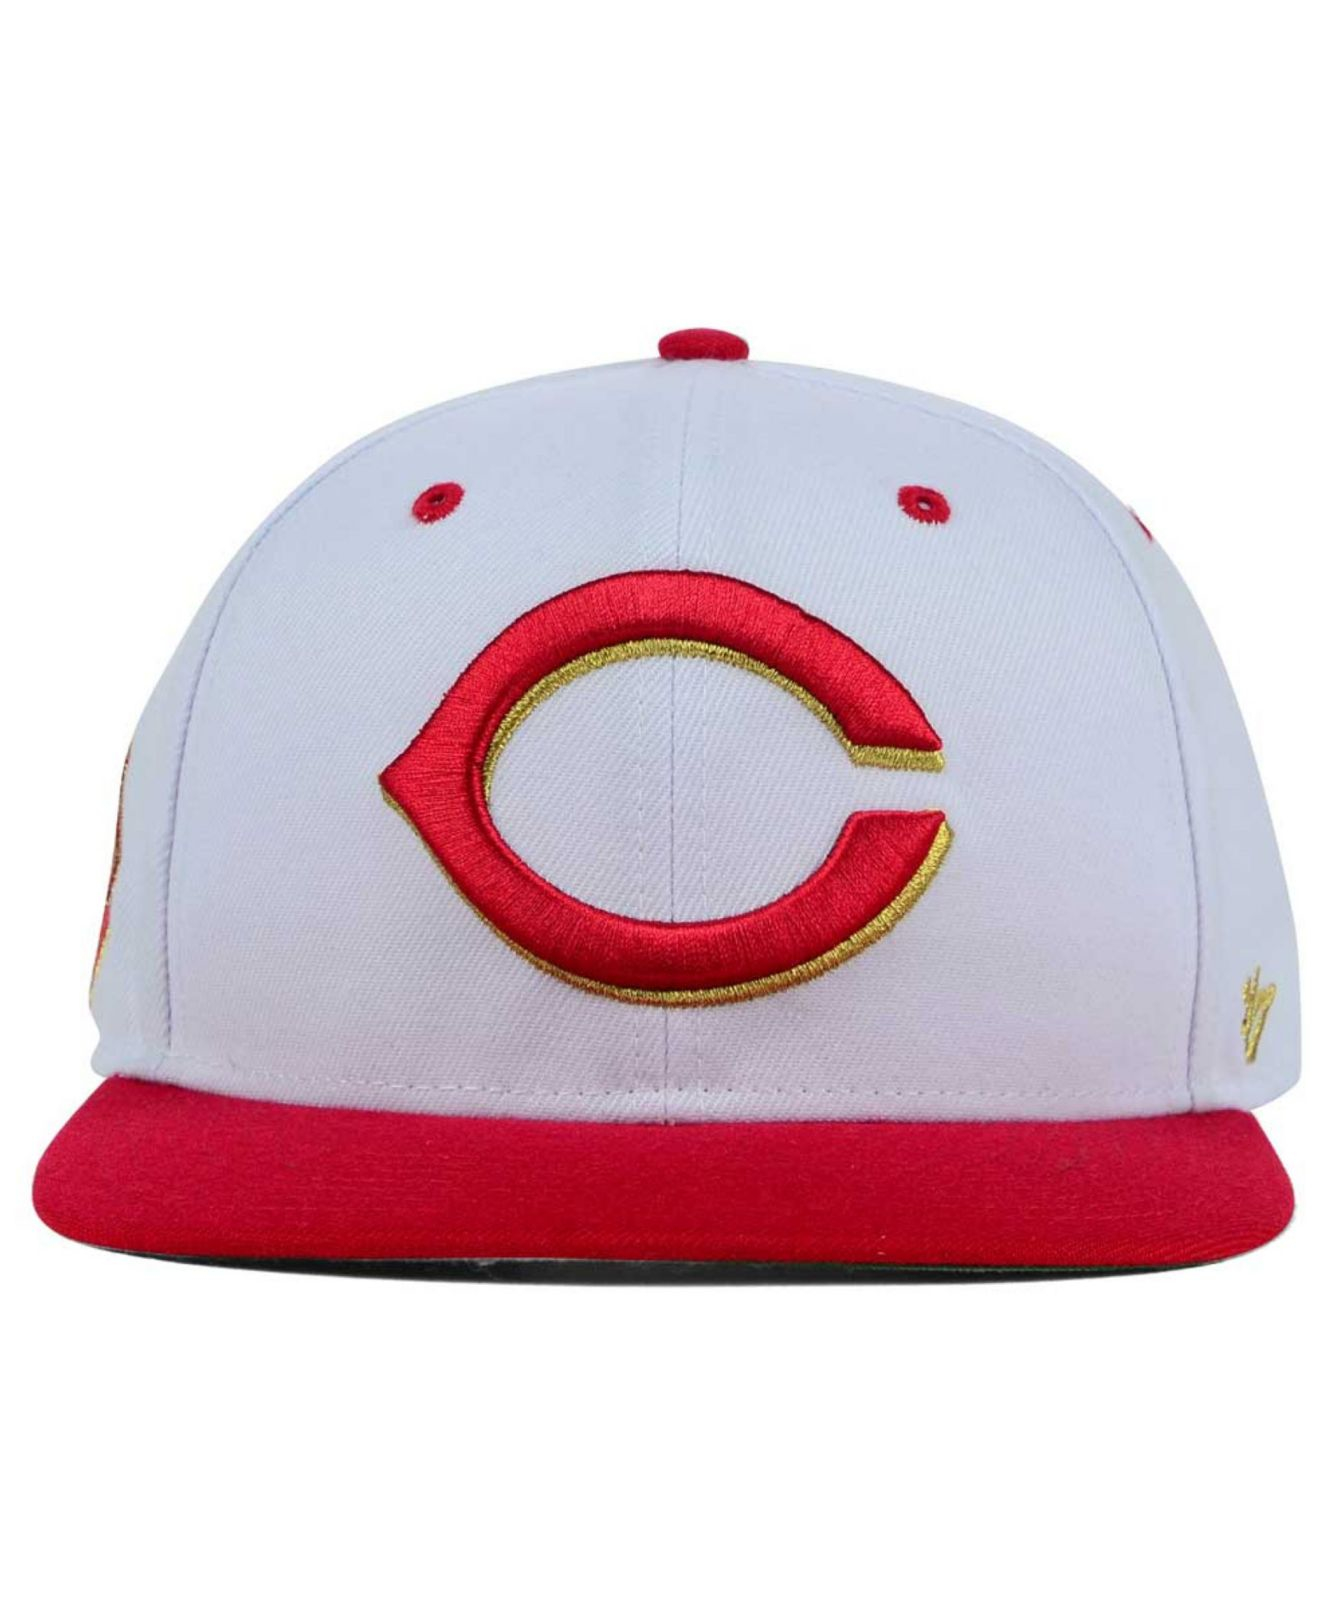 new concept 31646 7b433 ... low cost black and gold cincinnati reds hat hat cc33d 8085a